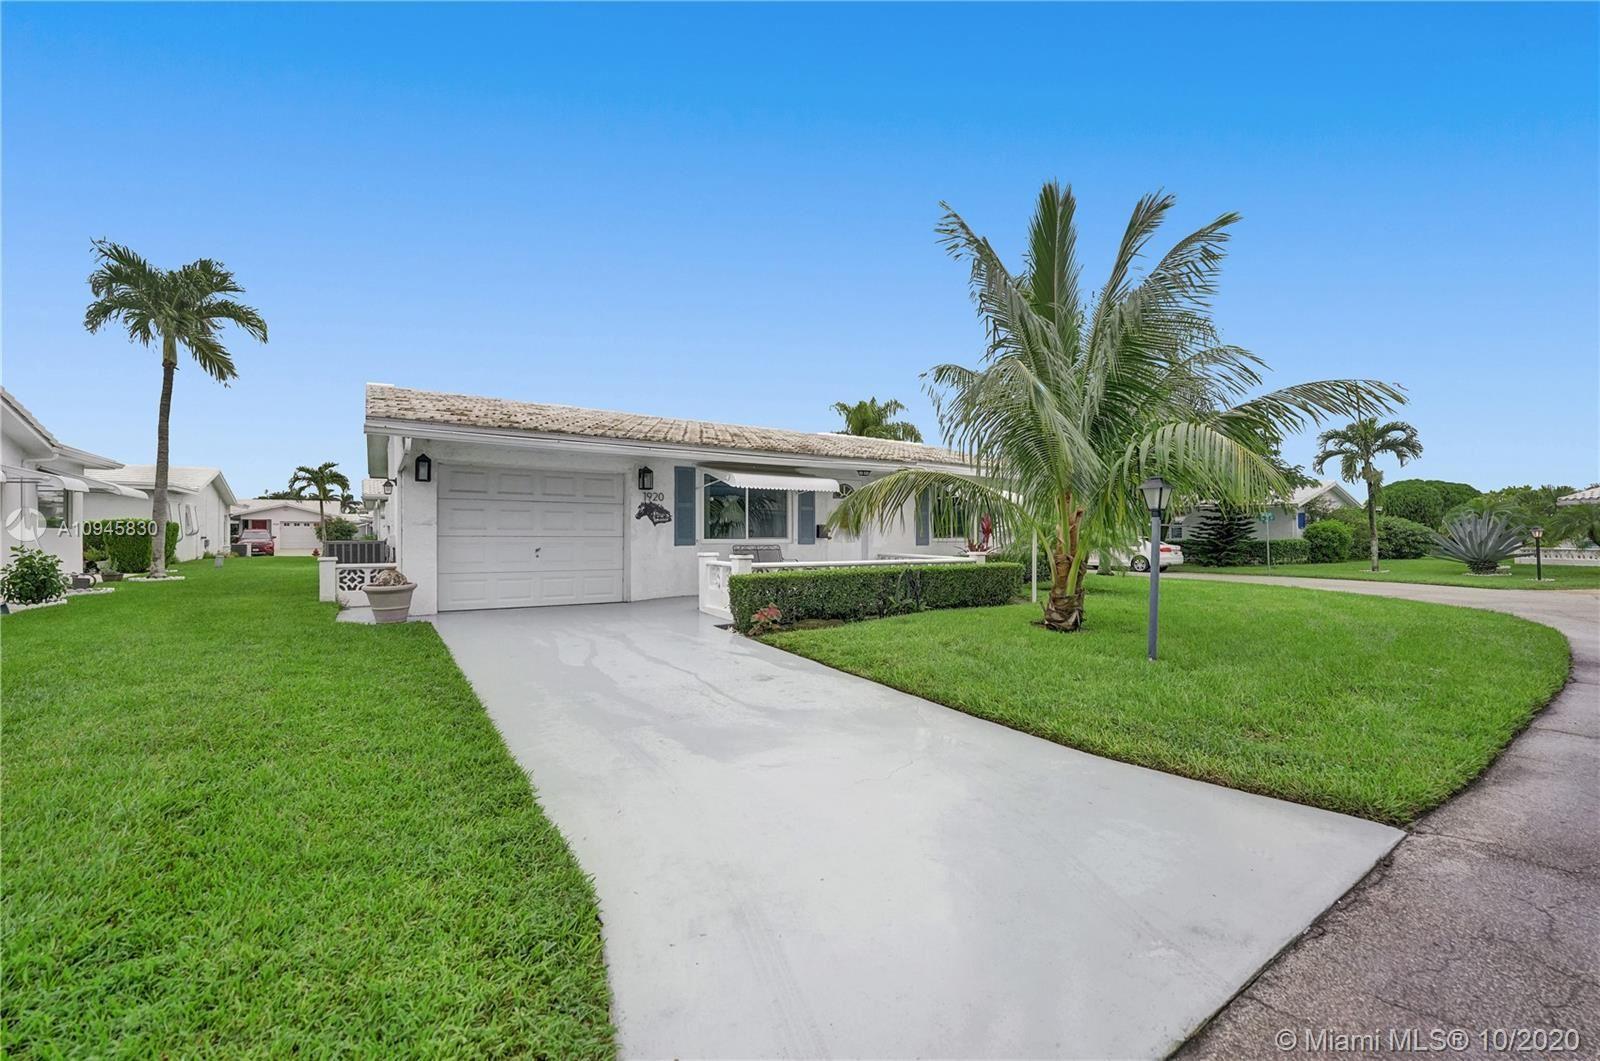 1920 SW 16th Ave, Boynton Beach, FL 33426 - #: A10945830